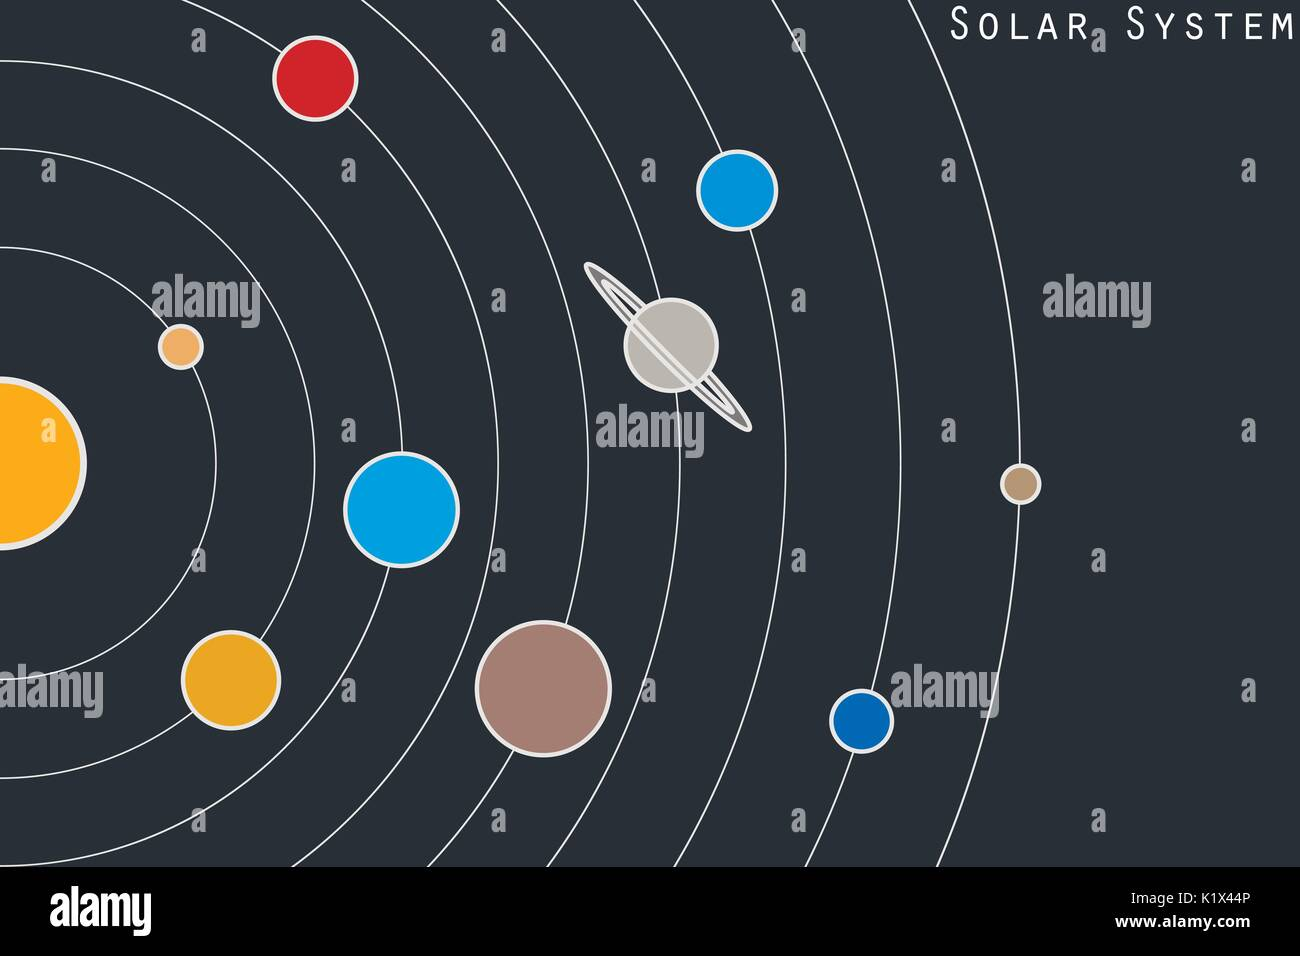 solar system vector - photo #6